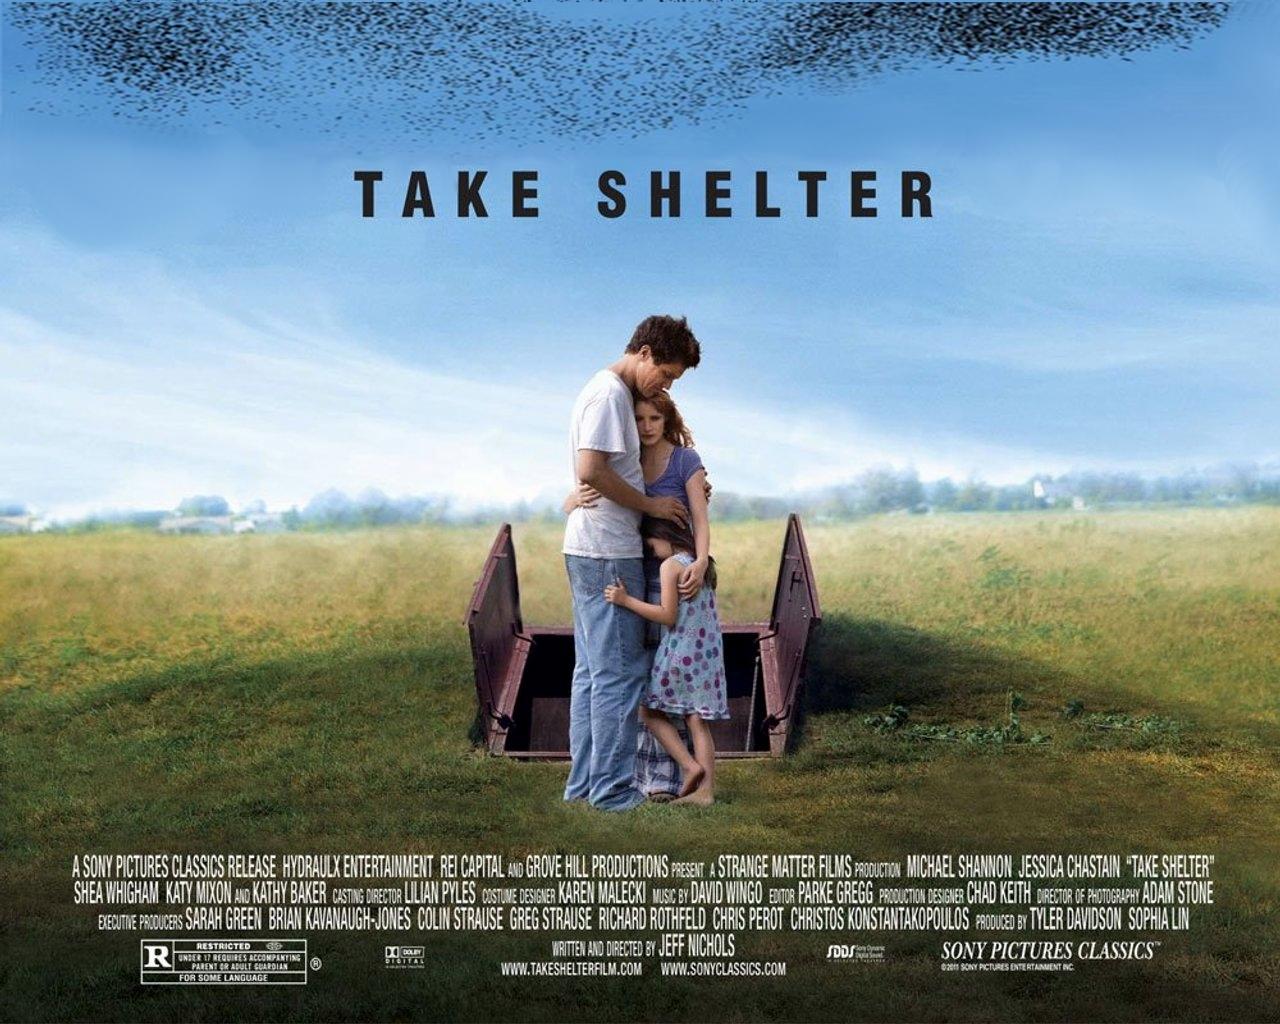 http://1.bp.blogspot.com/-3Rr77Lh8F4M/Ty1nPQXvLvI/AAAAAAAALiE/xEth-6PpA68/s1600/Take-Shelter-Wallpaper-01.jpg